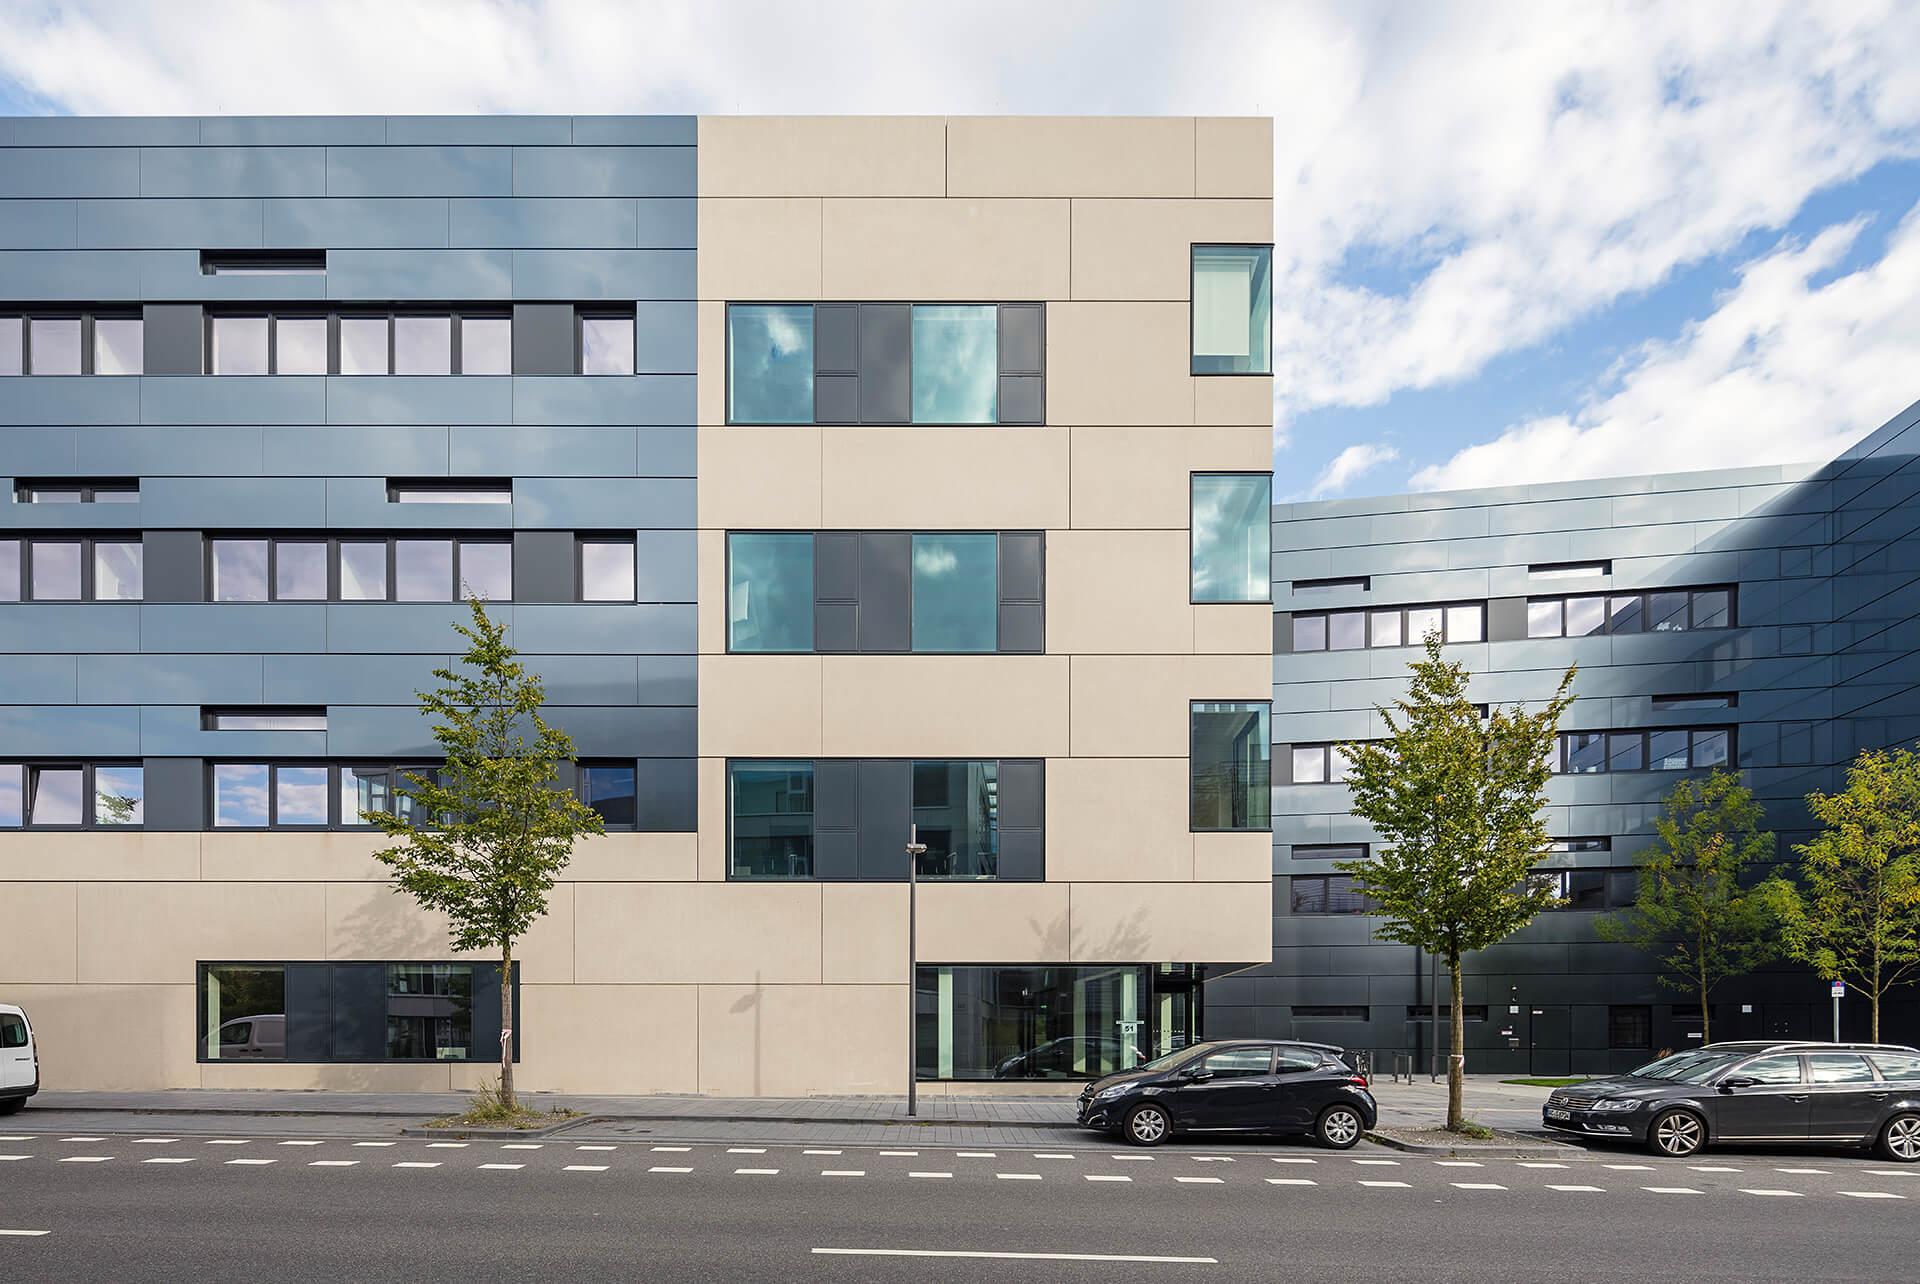 Ksg architekten ngp aachen - Architekten aachen ...